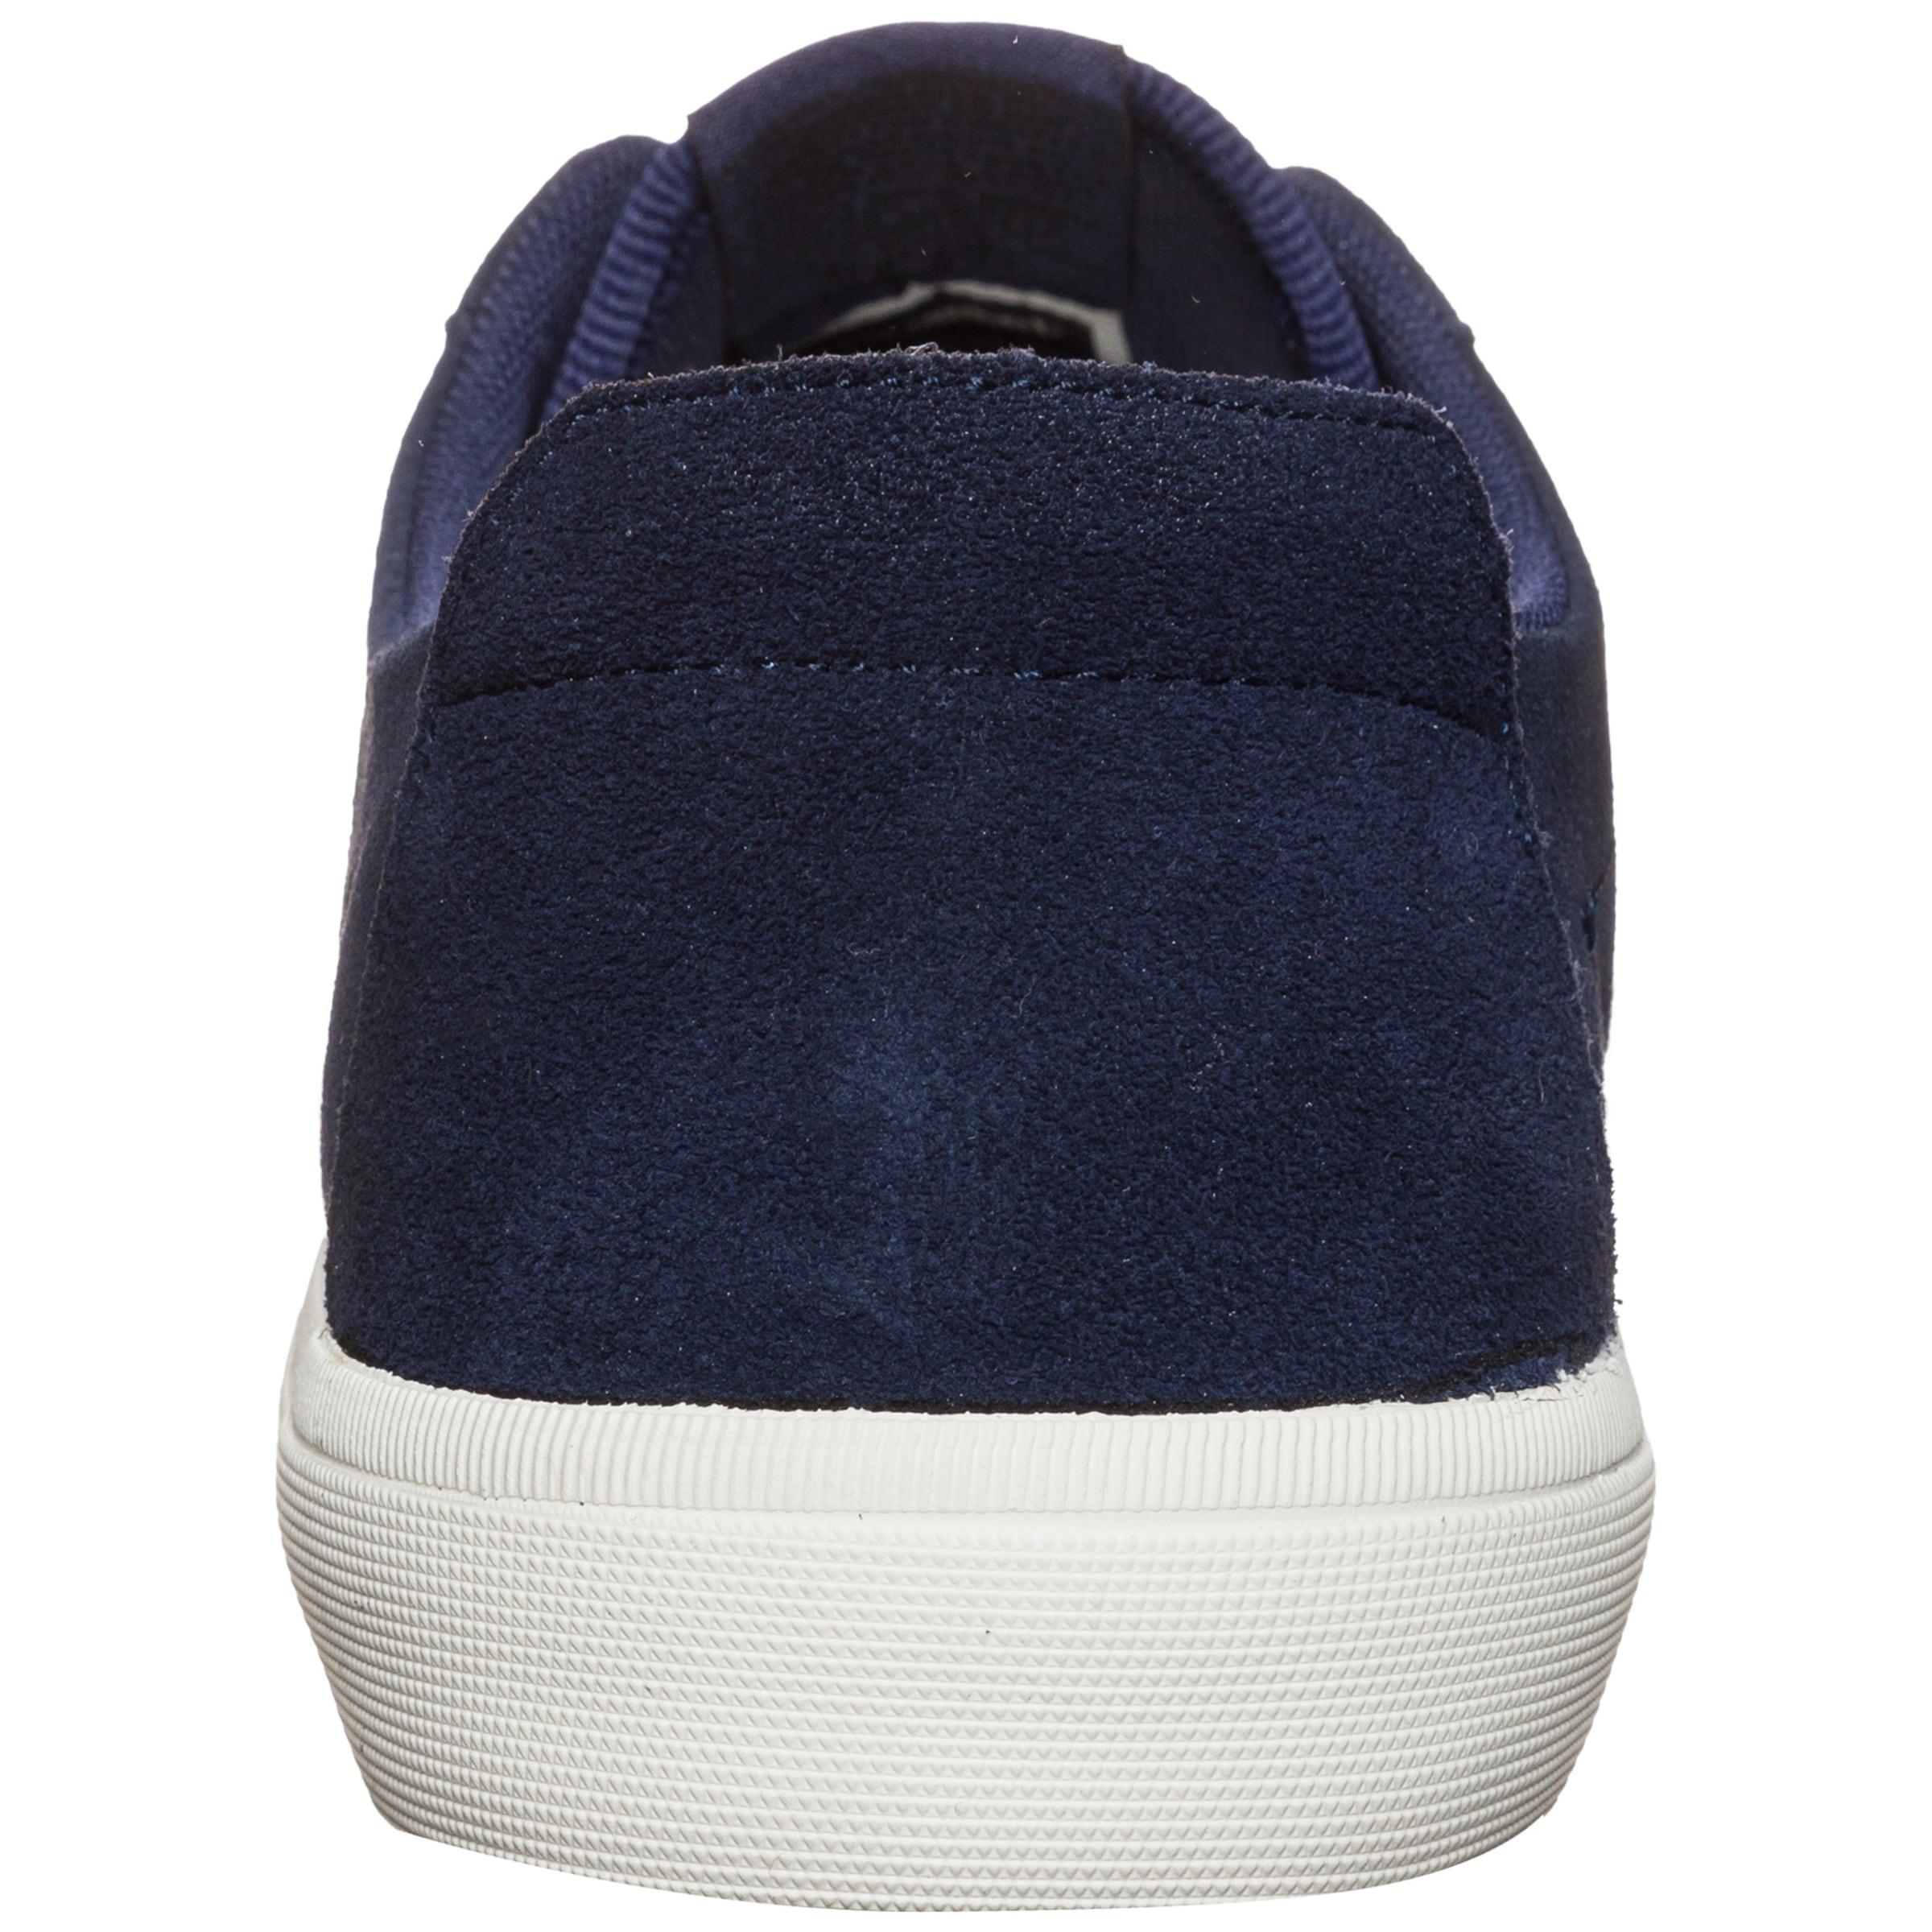 Suede' Hummel 'stockholm Blau Low In Sneaker Herren K1FJc3Tl